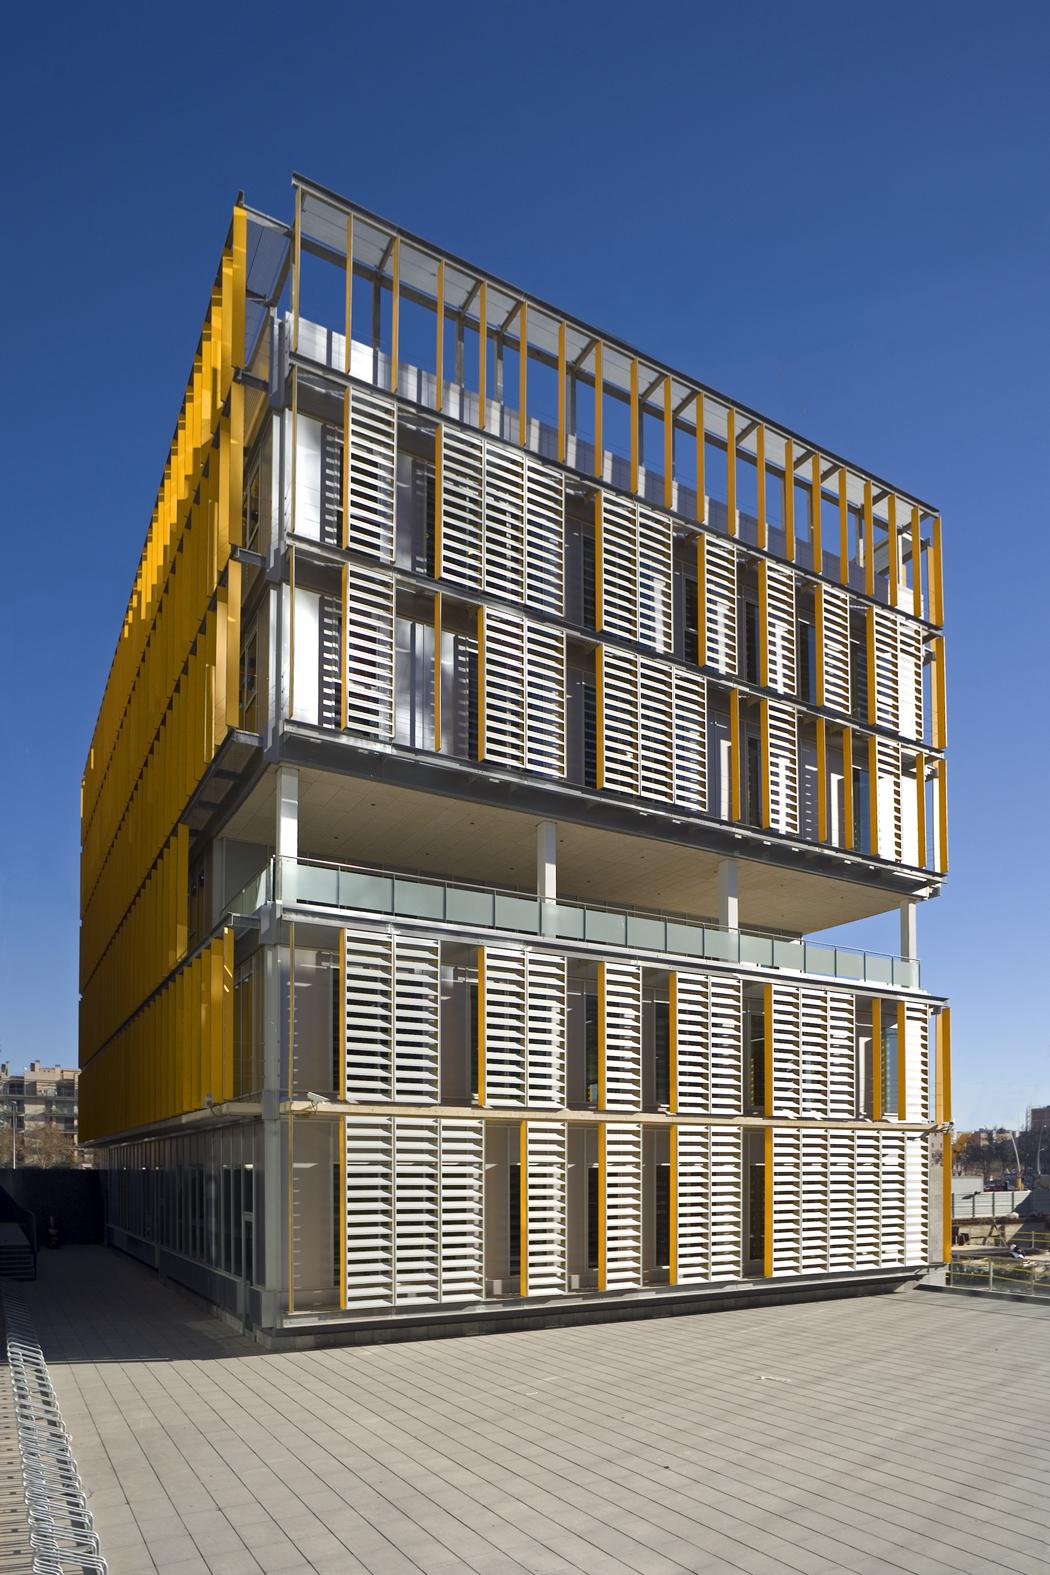 Radio Nacional da Espanha Headquarters / Ravetllat-Ribas, © Roger Casas